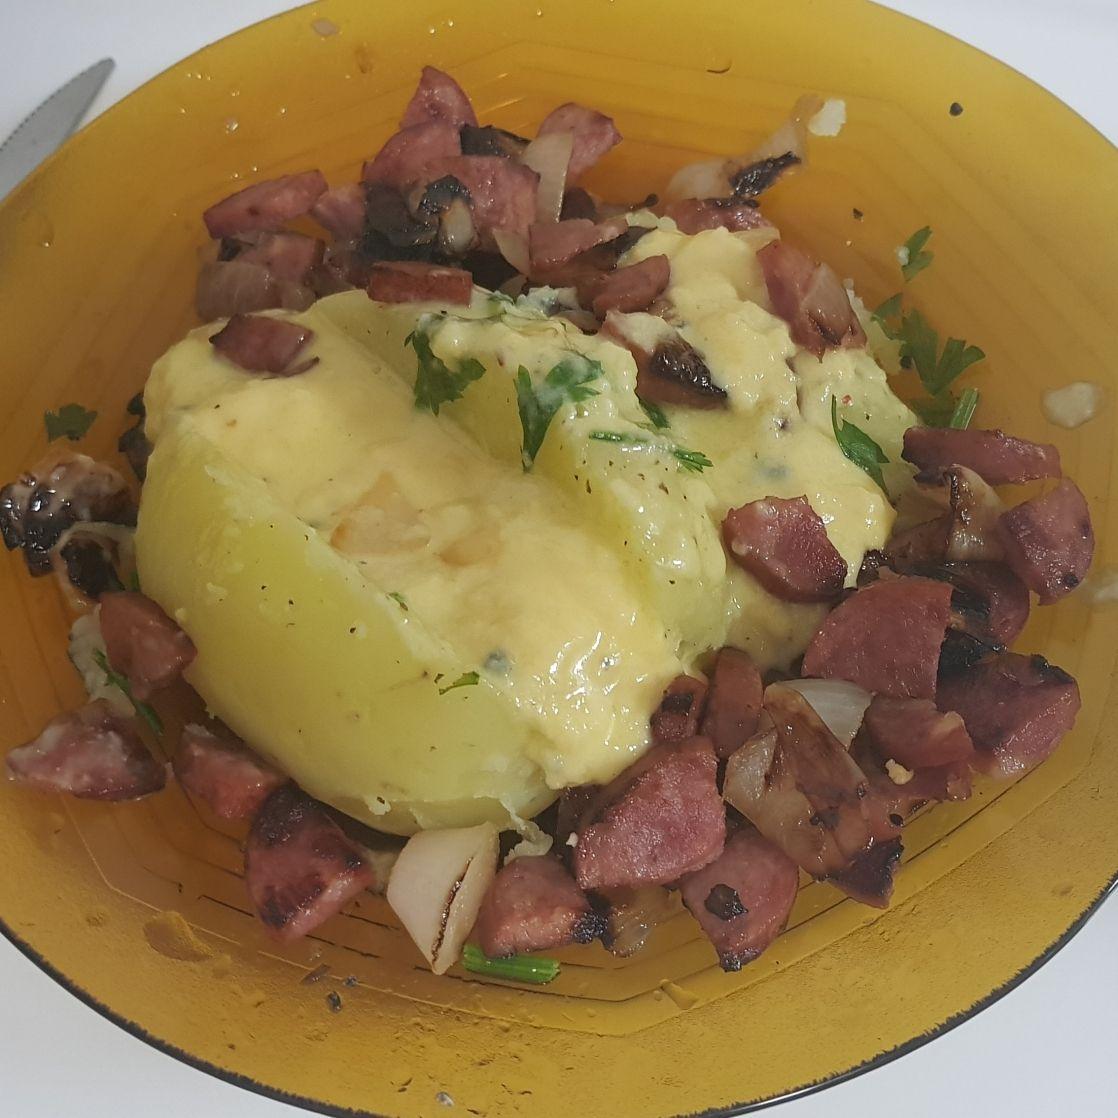 Batata e queijo com linguiça